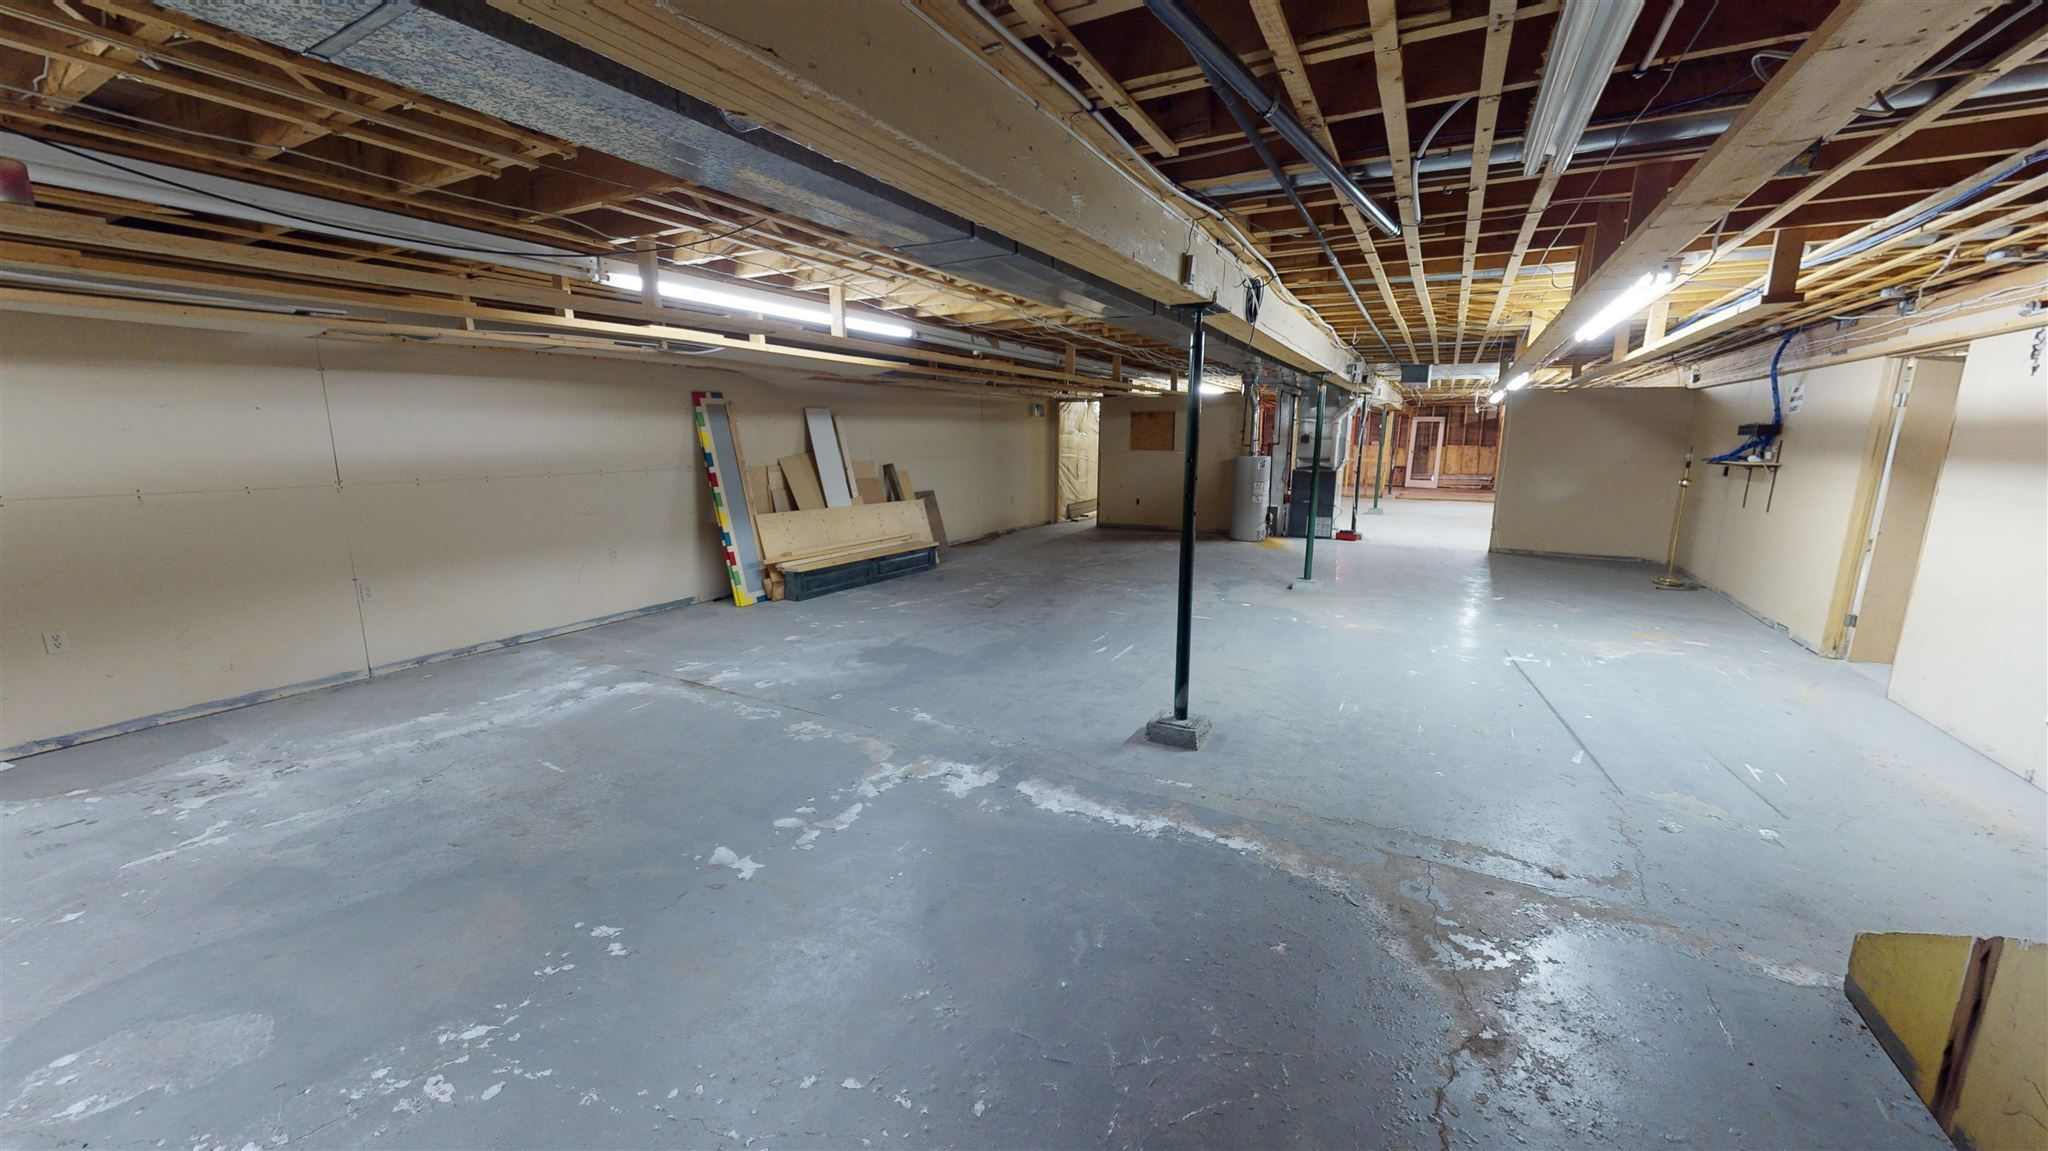 Photo 34: Photos: 10067 100 Avenue in Fort St. John: Fort St. John - City NW Office for sale (Fort St. John (Zone 60))  : MLS®# C8039097